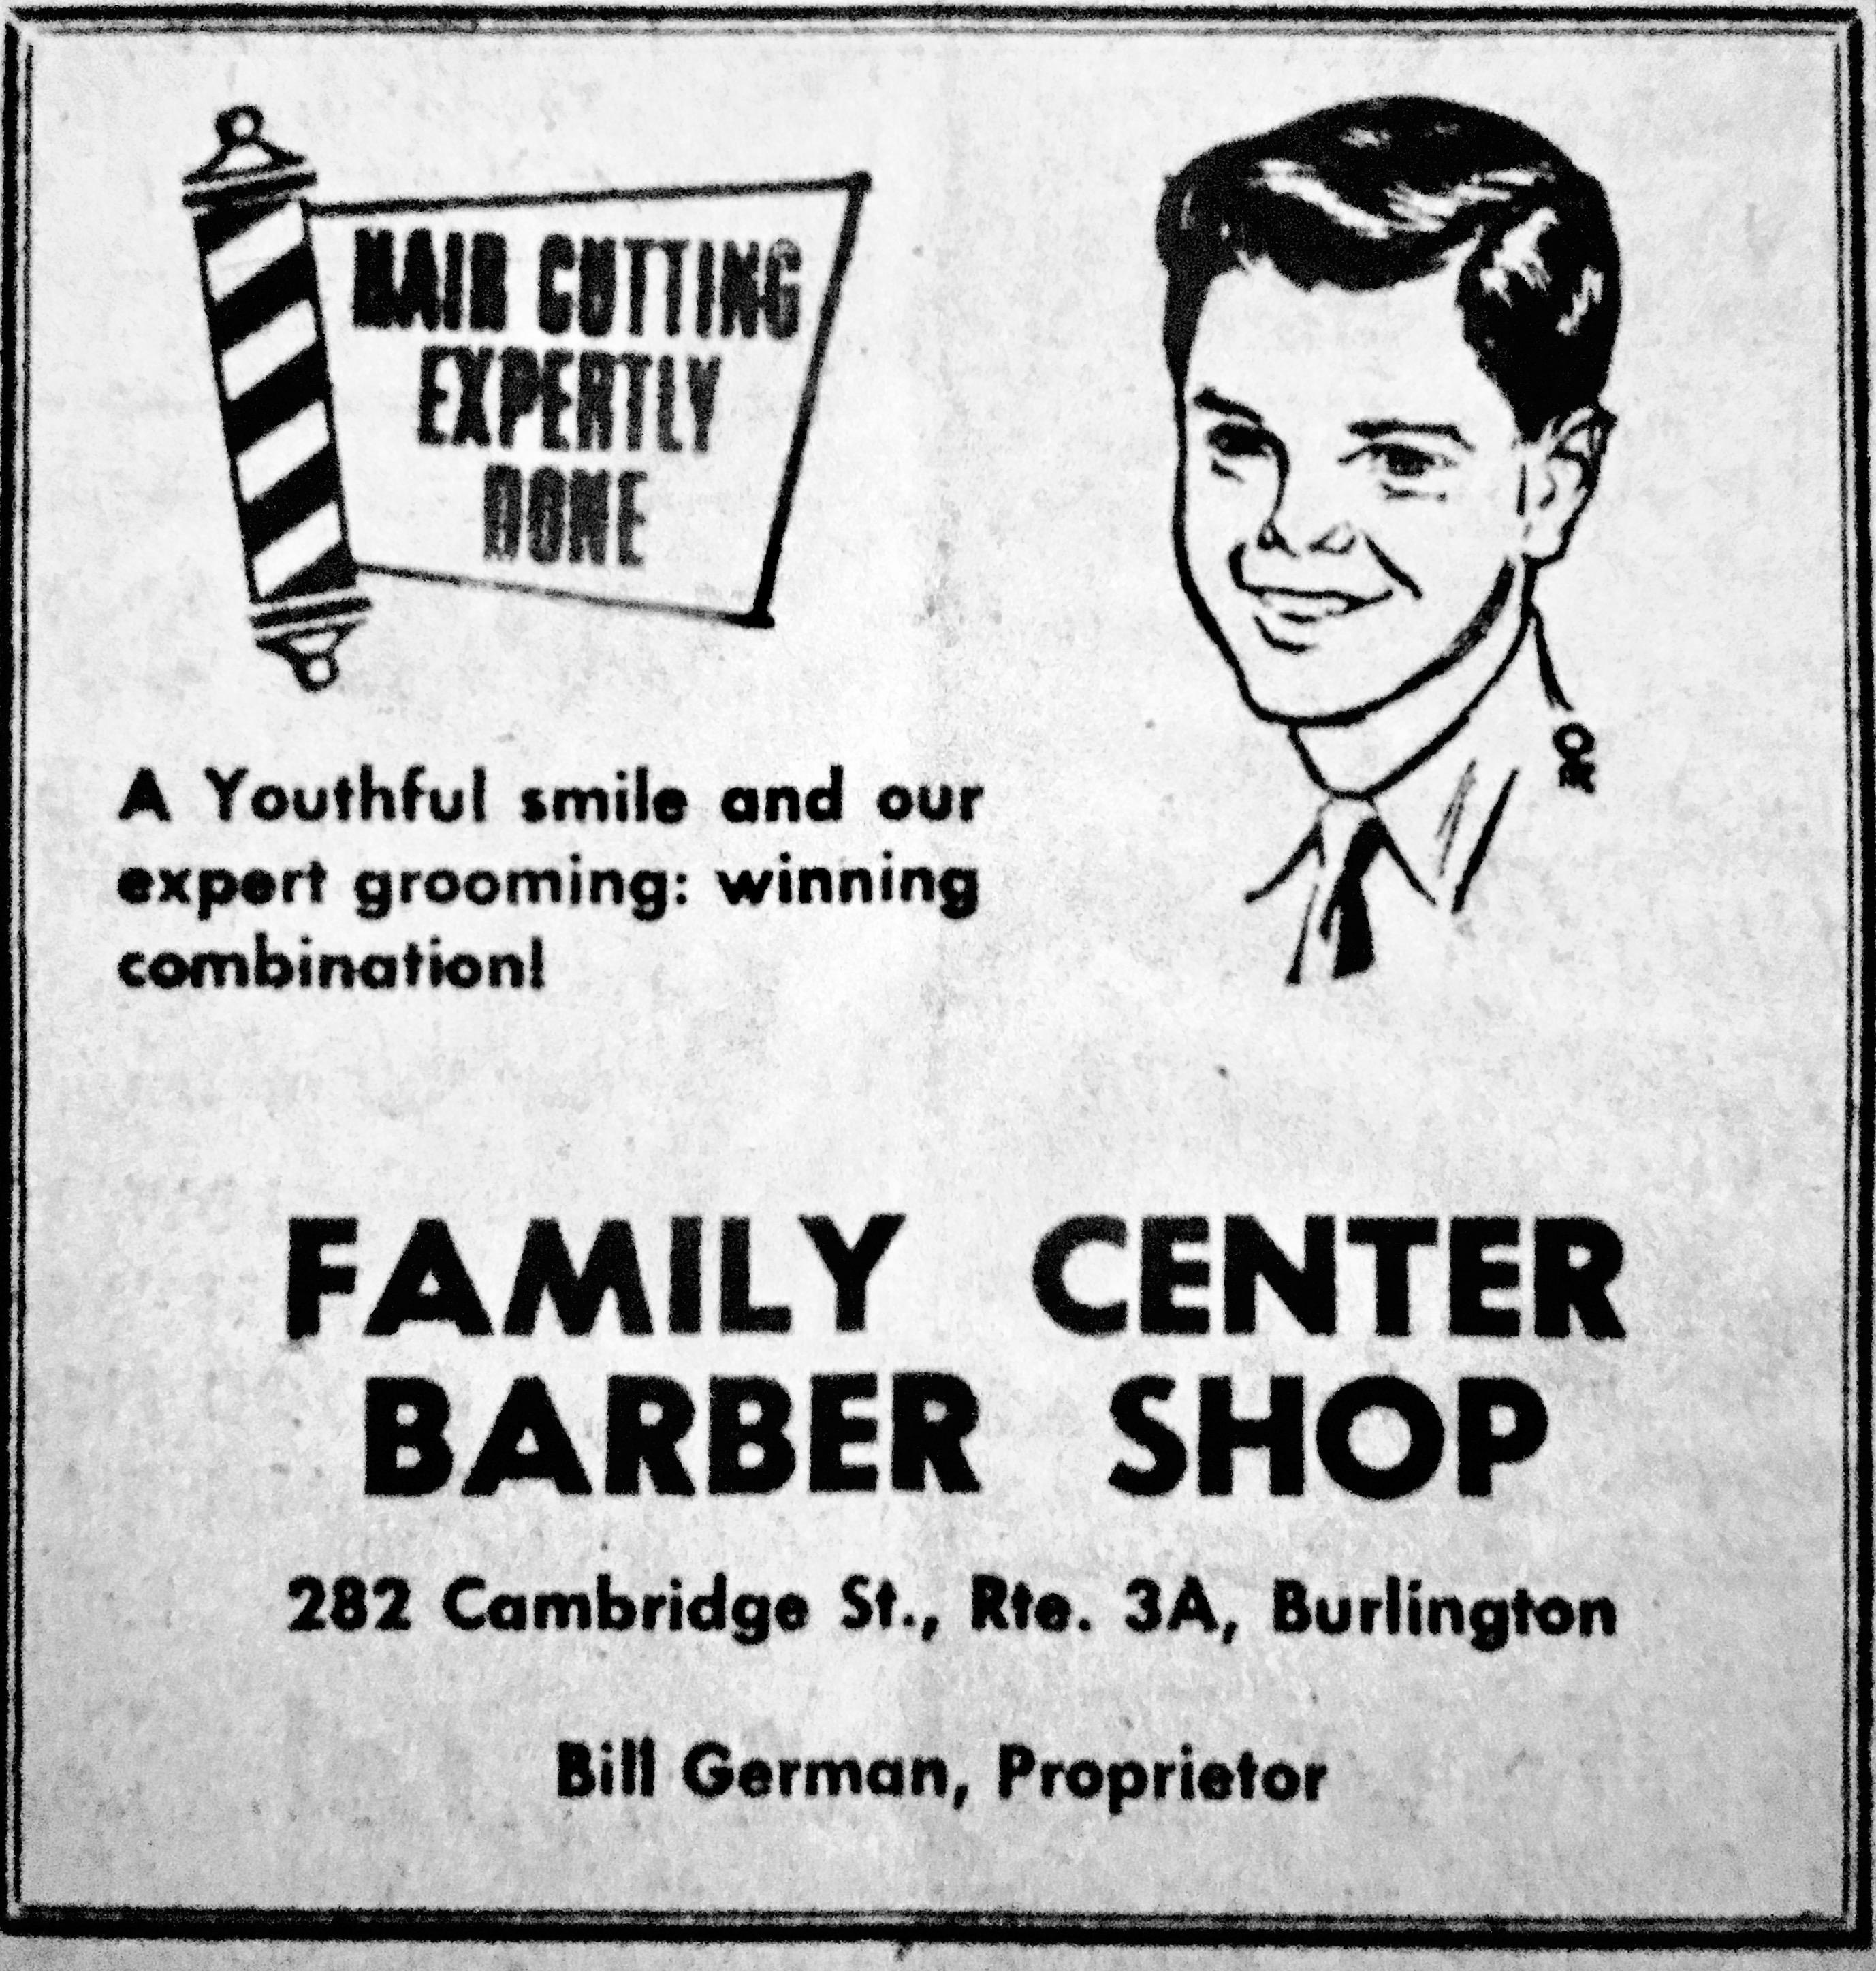 Family Center Barber Shop, Burlington MA